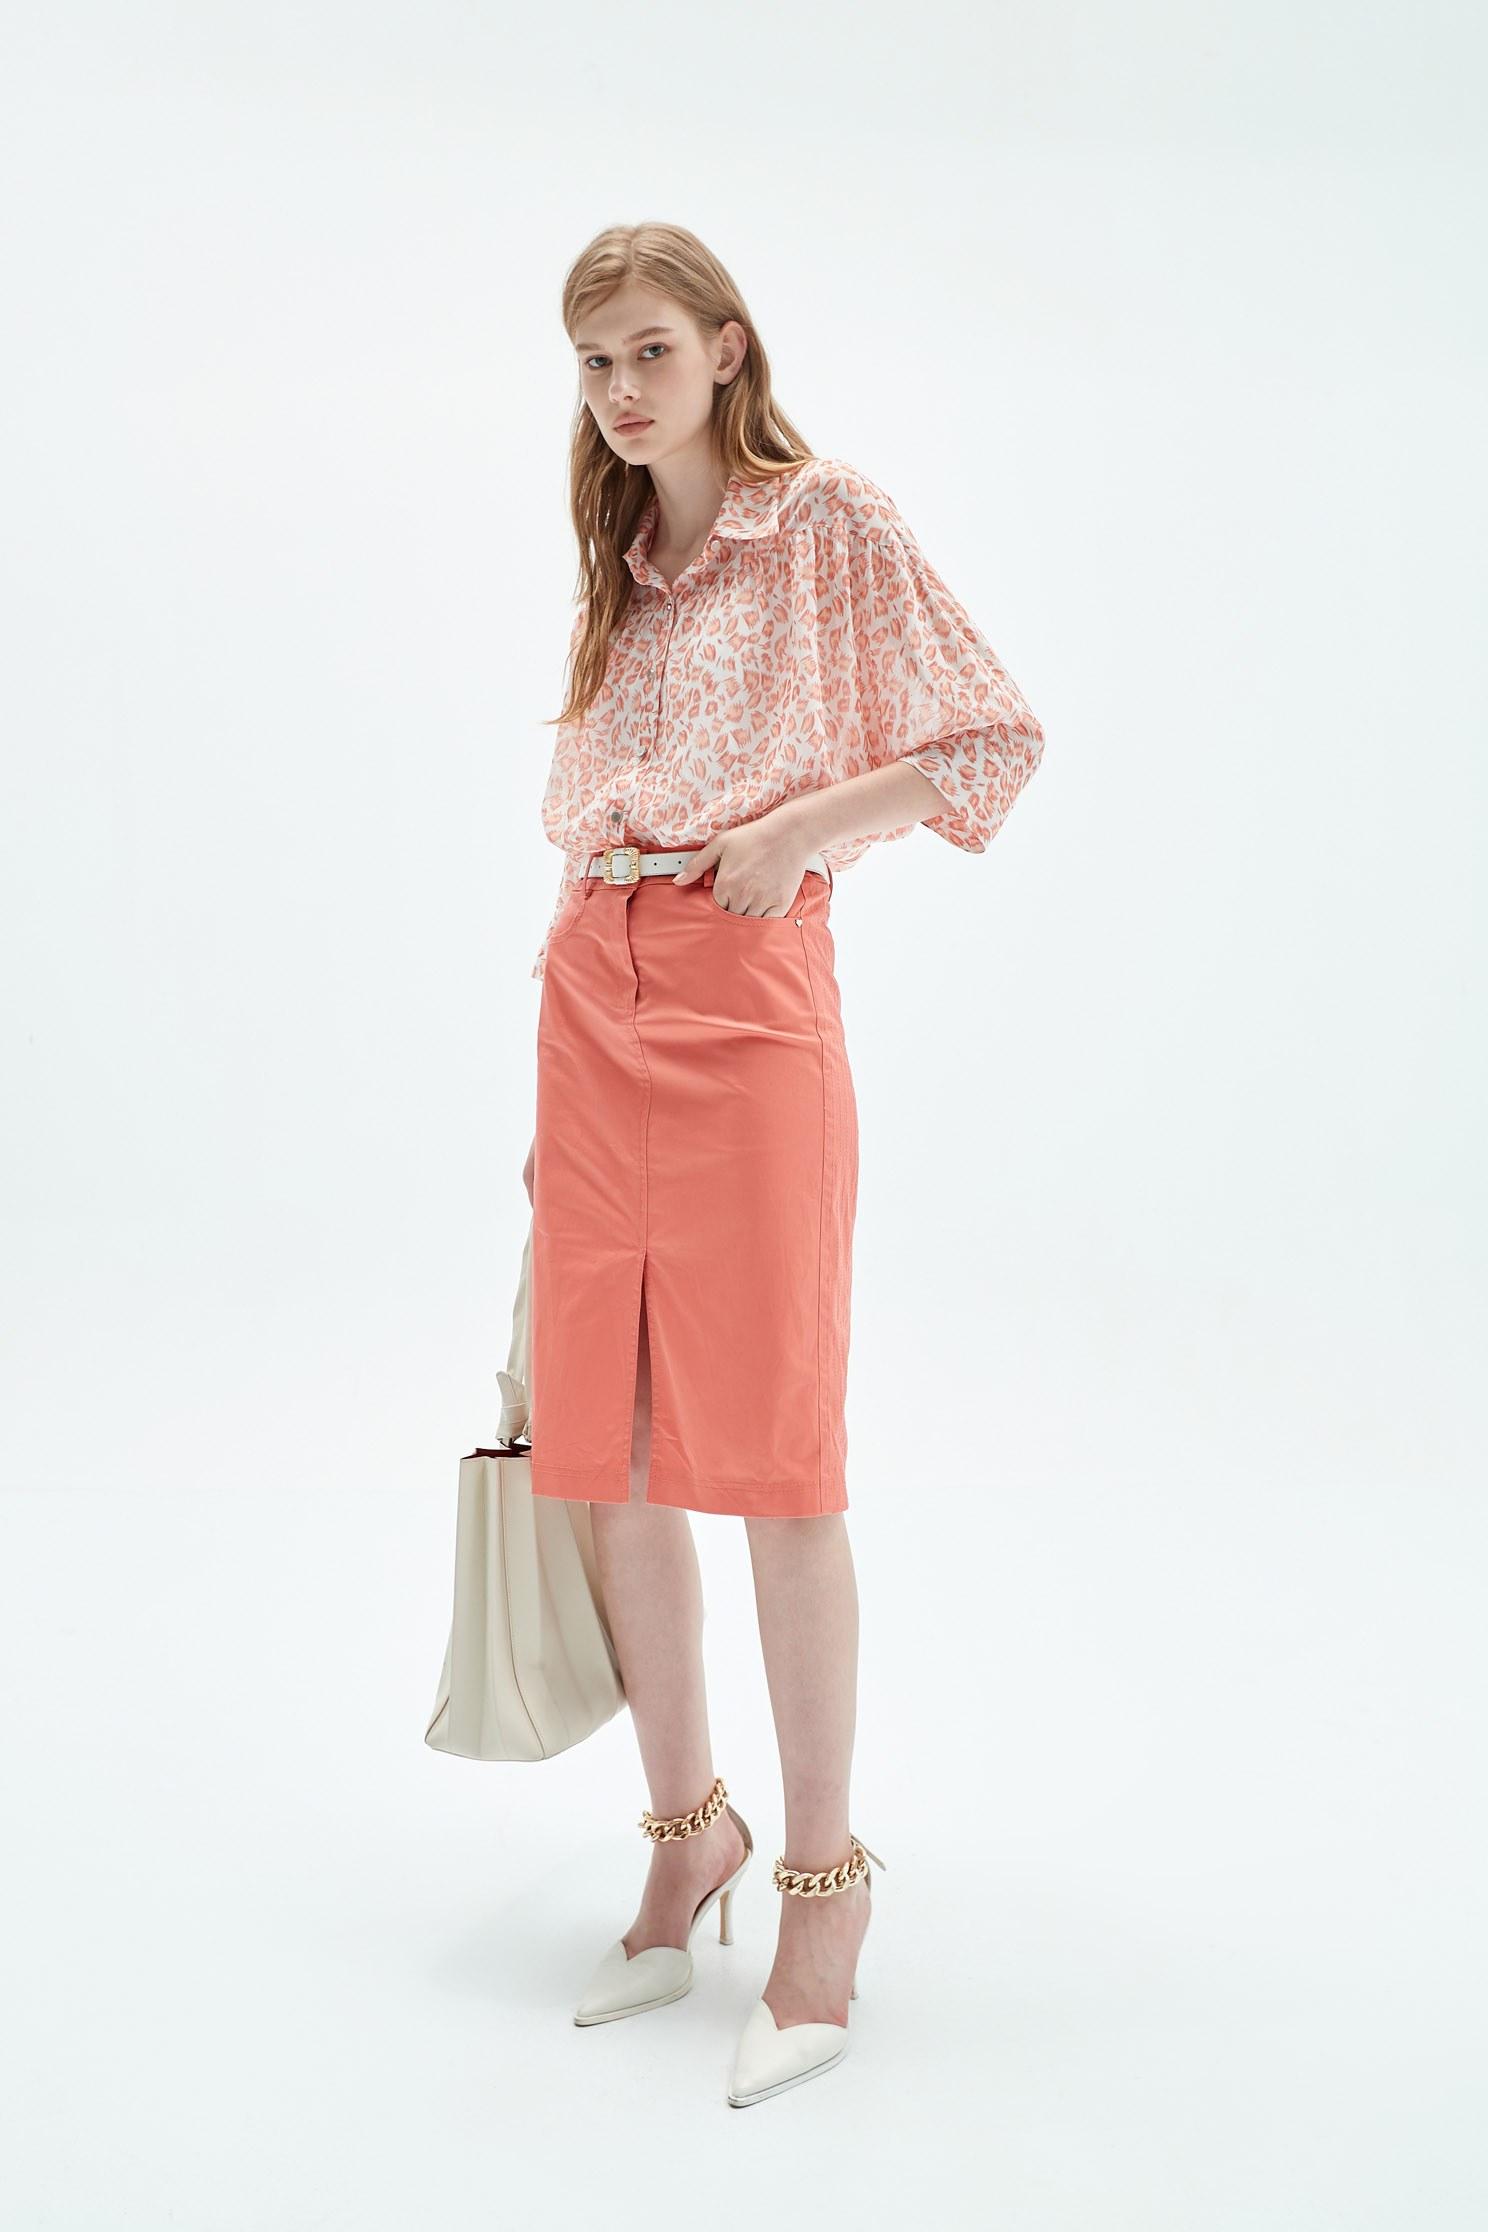 Chiffon pink top with  leopard print,Tops,Season (SS) Look,Blouses,Chiffon